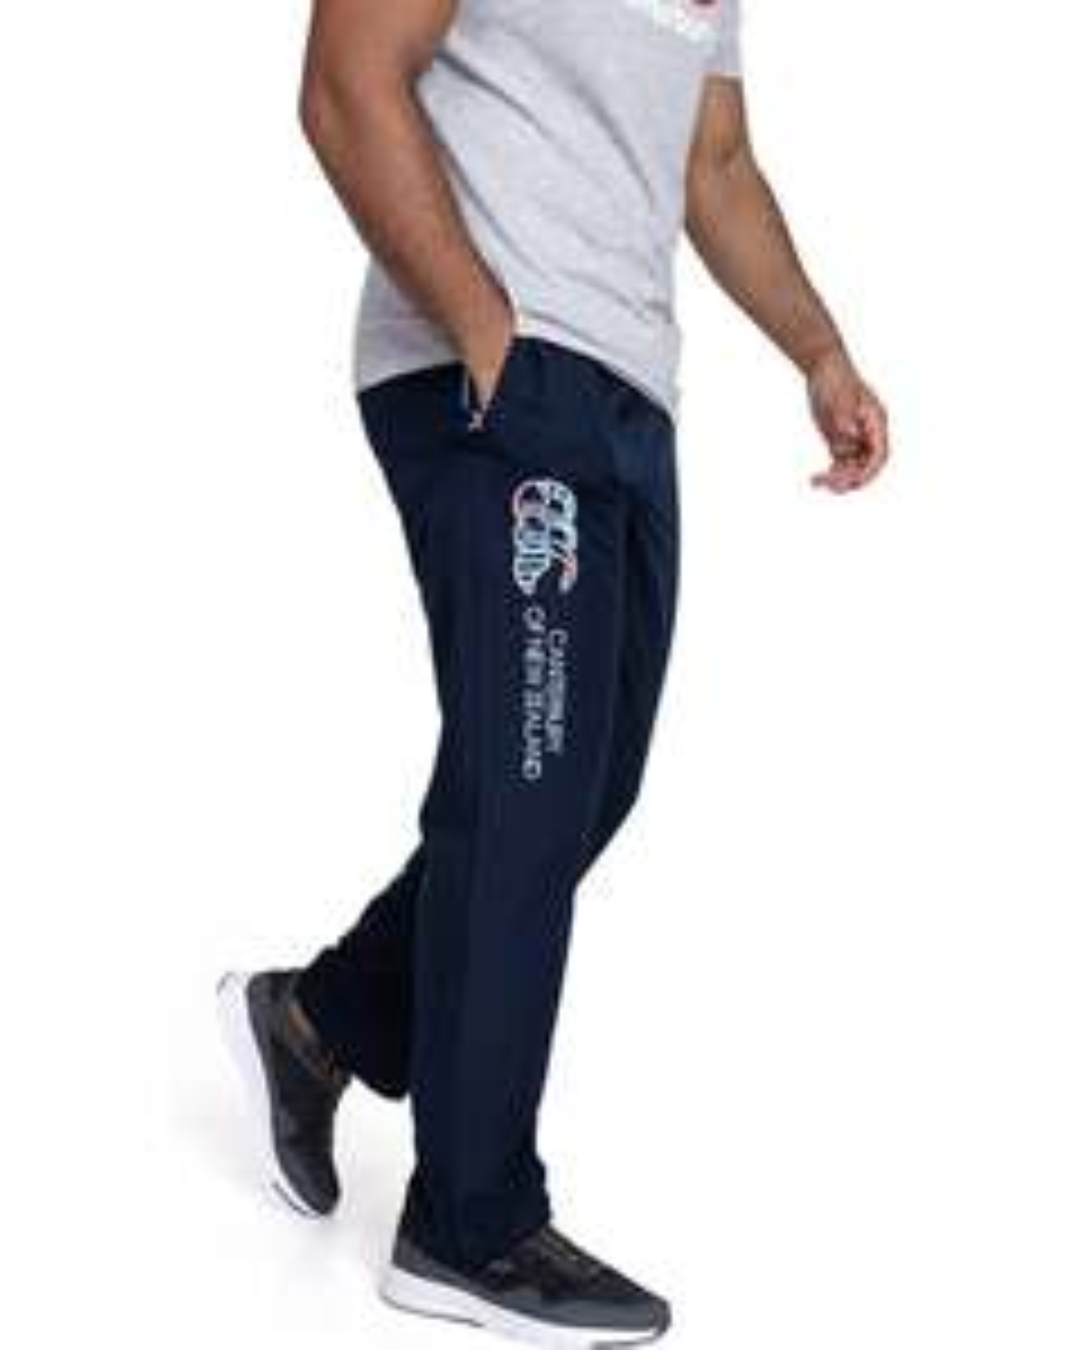 Men's Canterbury Uglies Open Hem Stadium Pants - £27.99 (sizes M, L & XL) @ Amazon